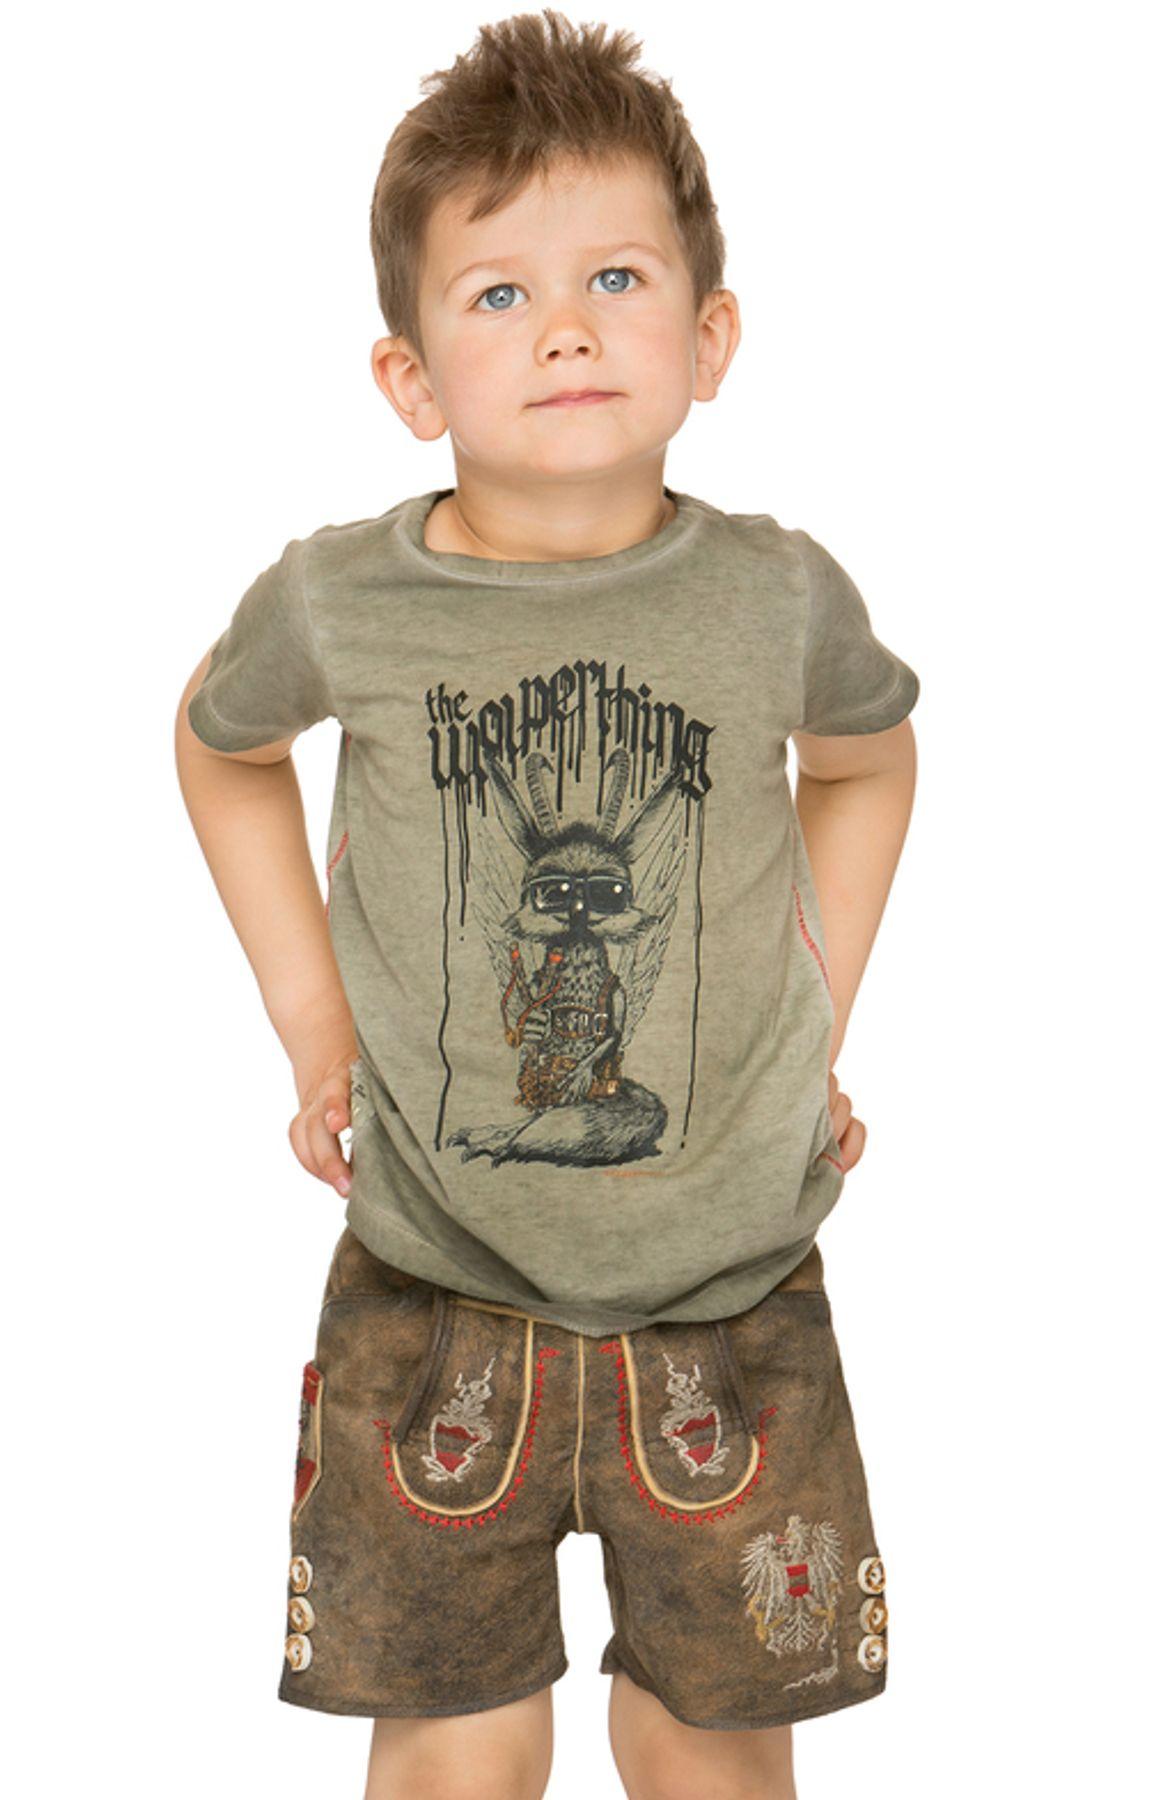 Stockerpoint - Kinder Trachten T-Shirt Wolpiboy, Gr. 86-140 – Bild 4